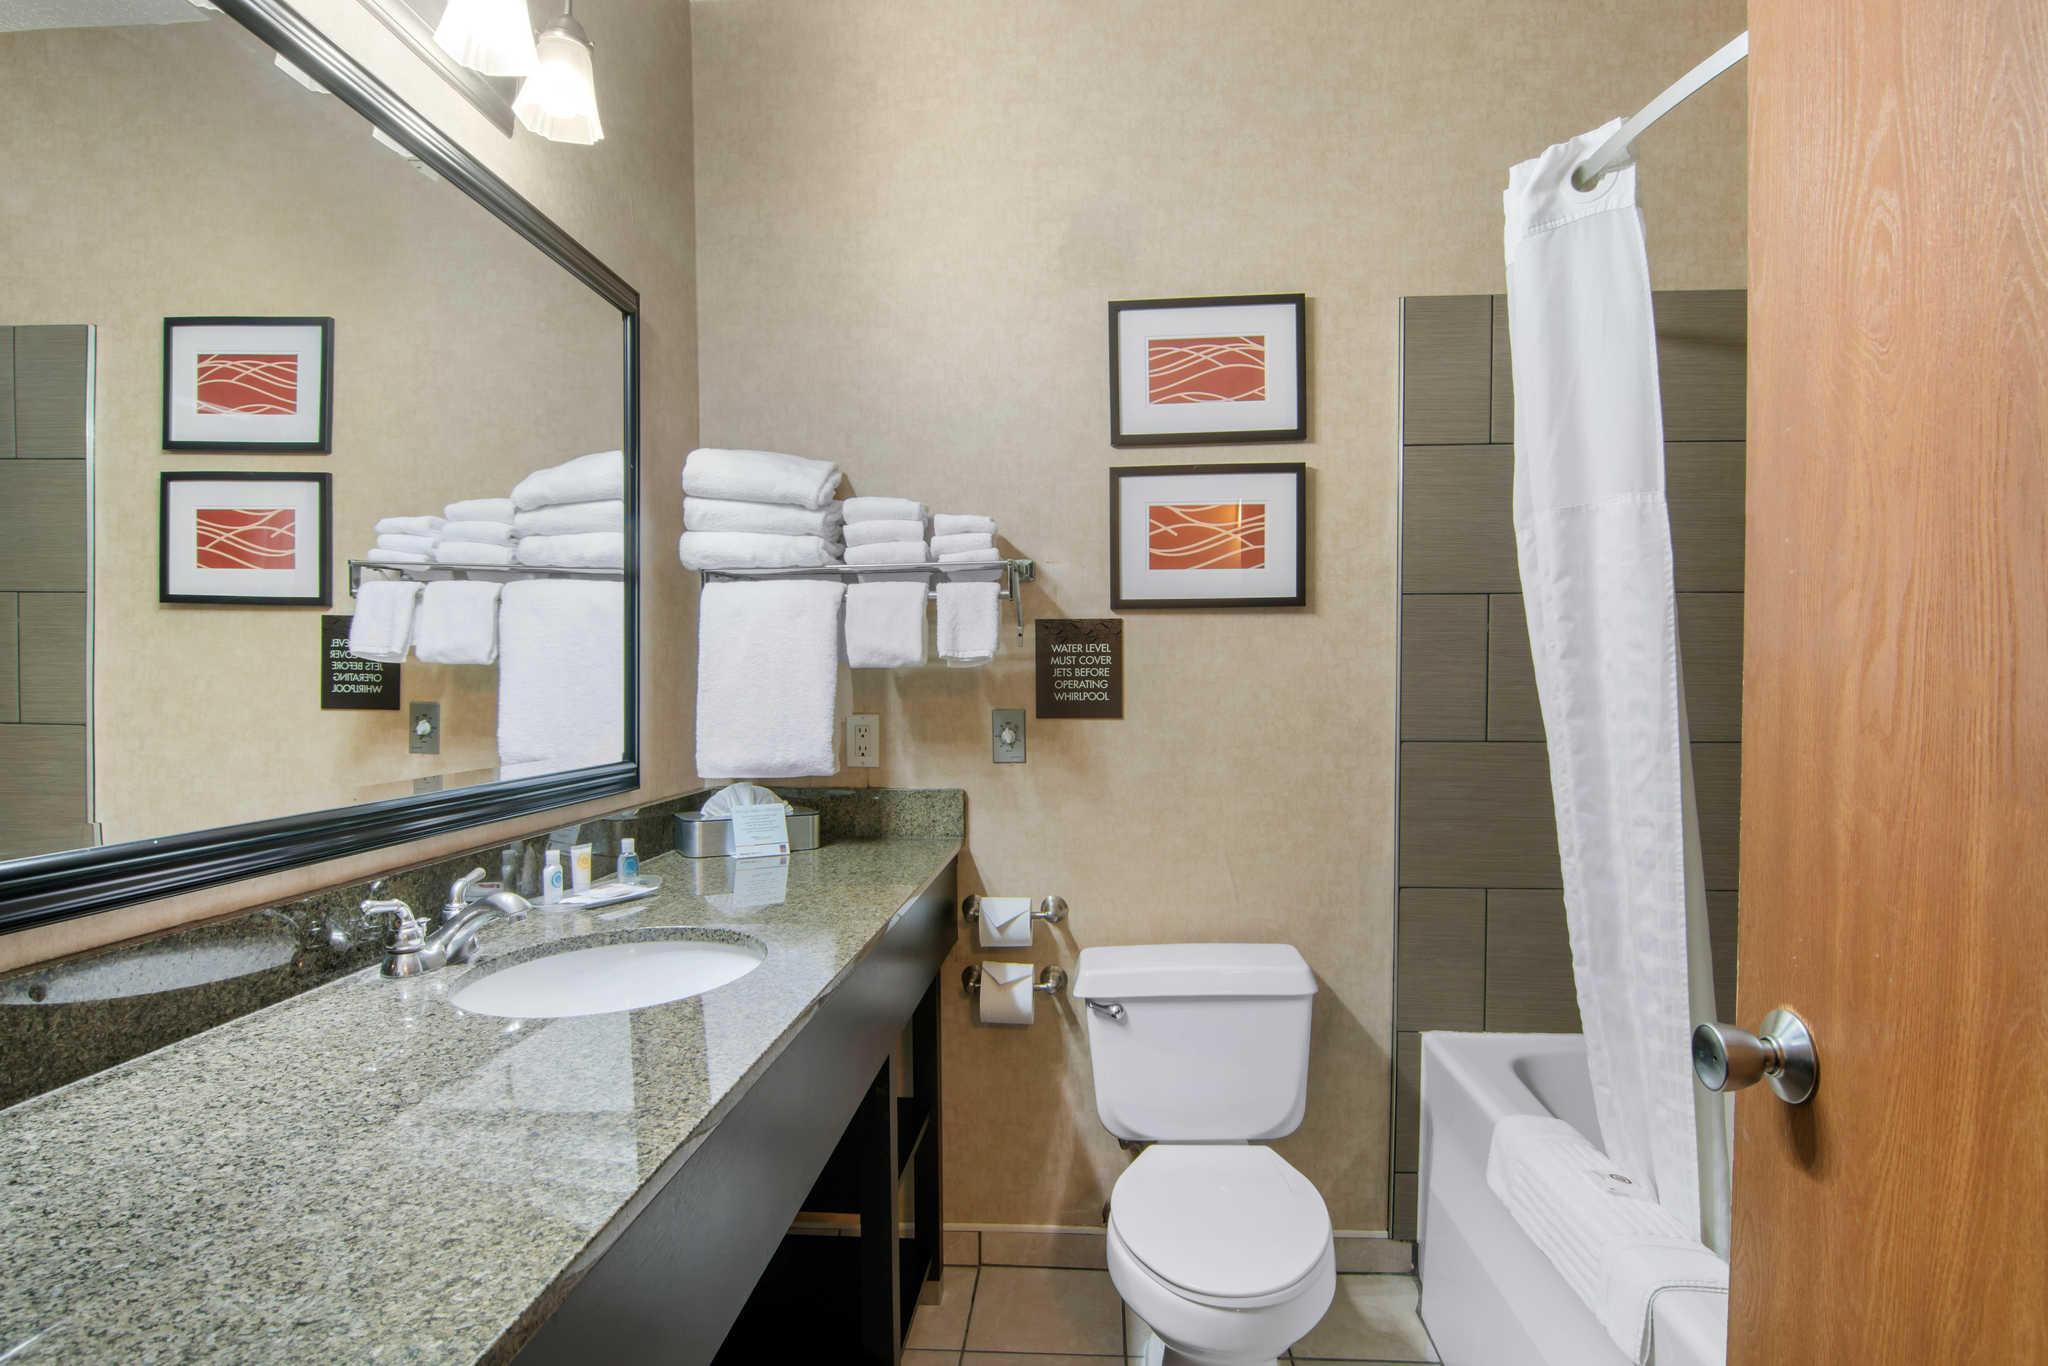 Comfort Suites image 14